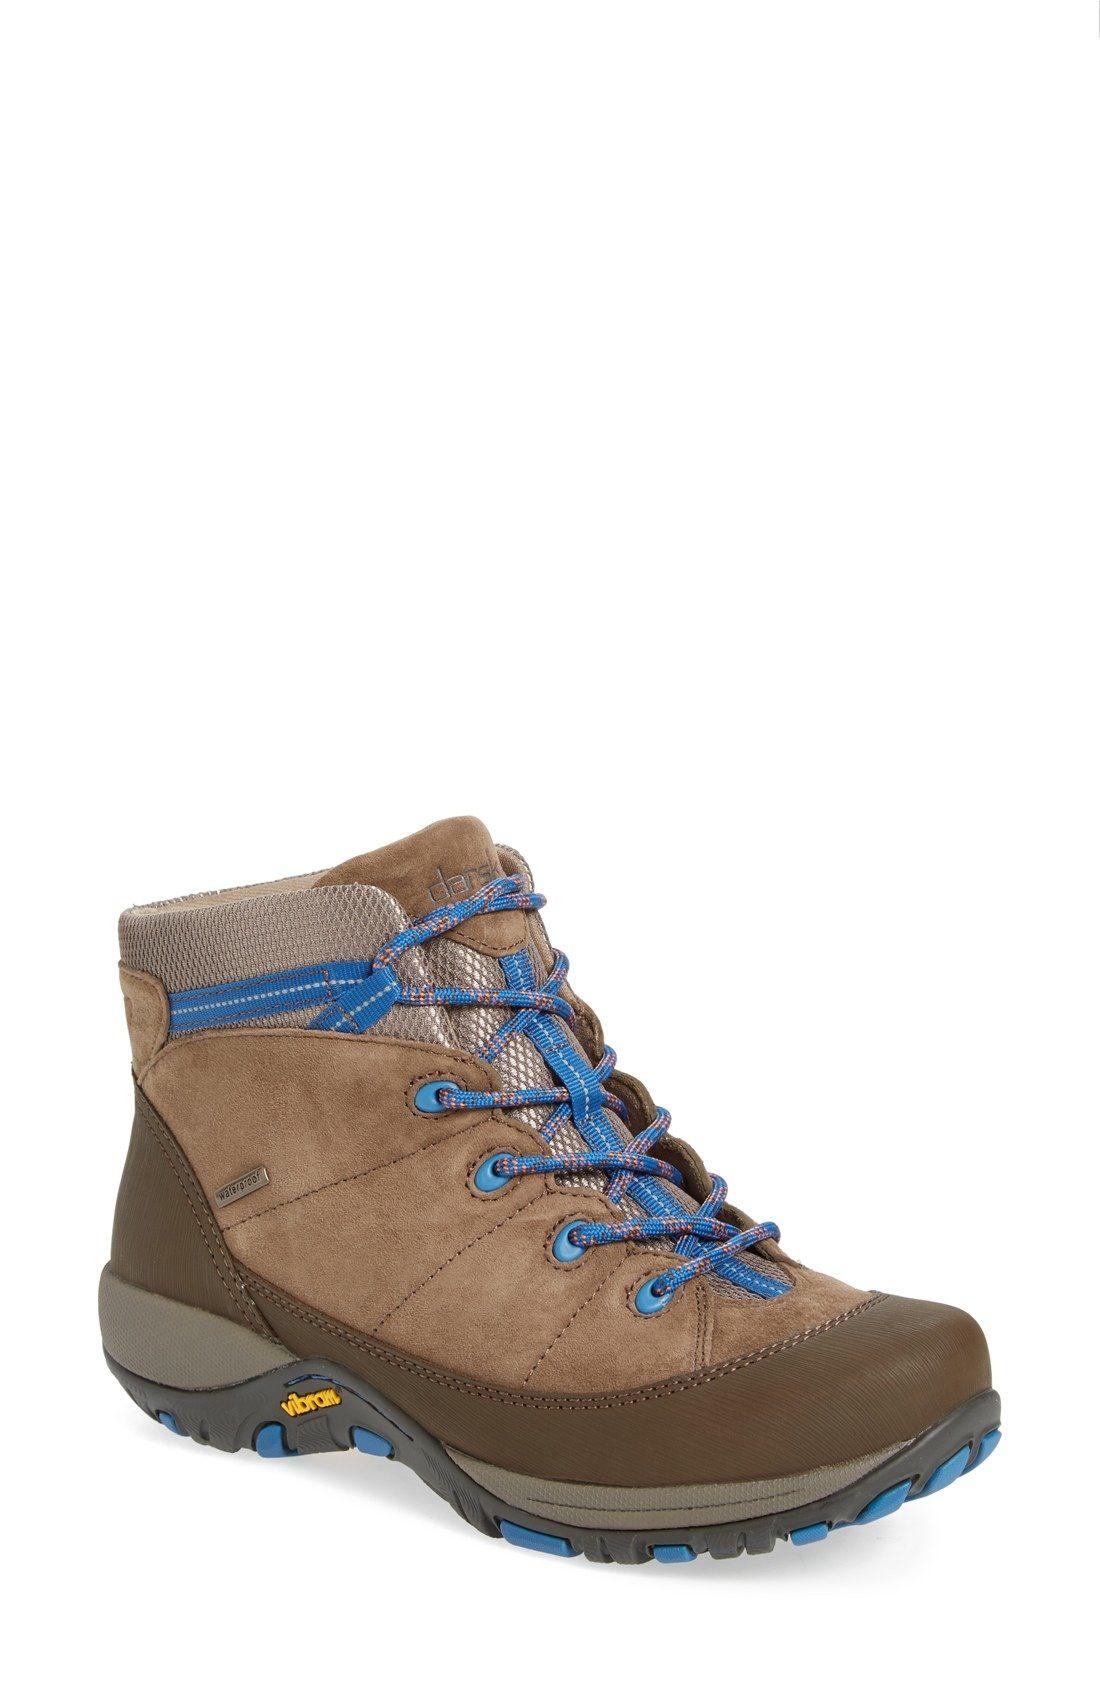 women's orthopedic hiking boots